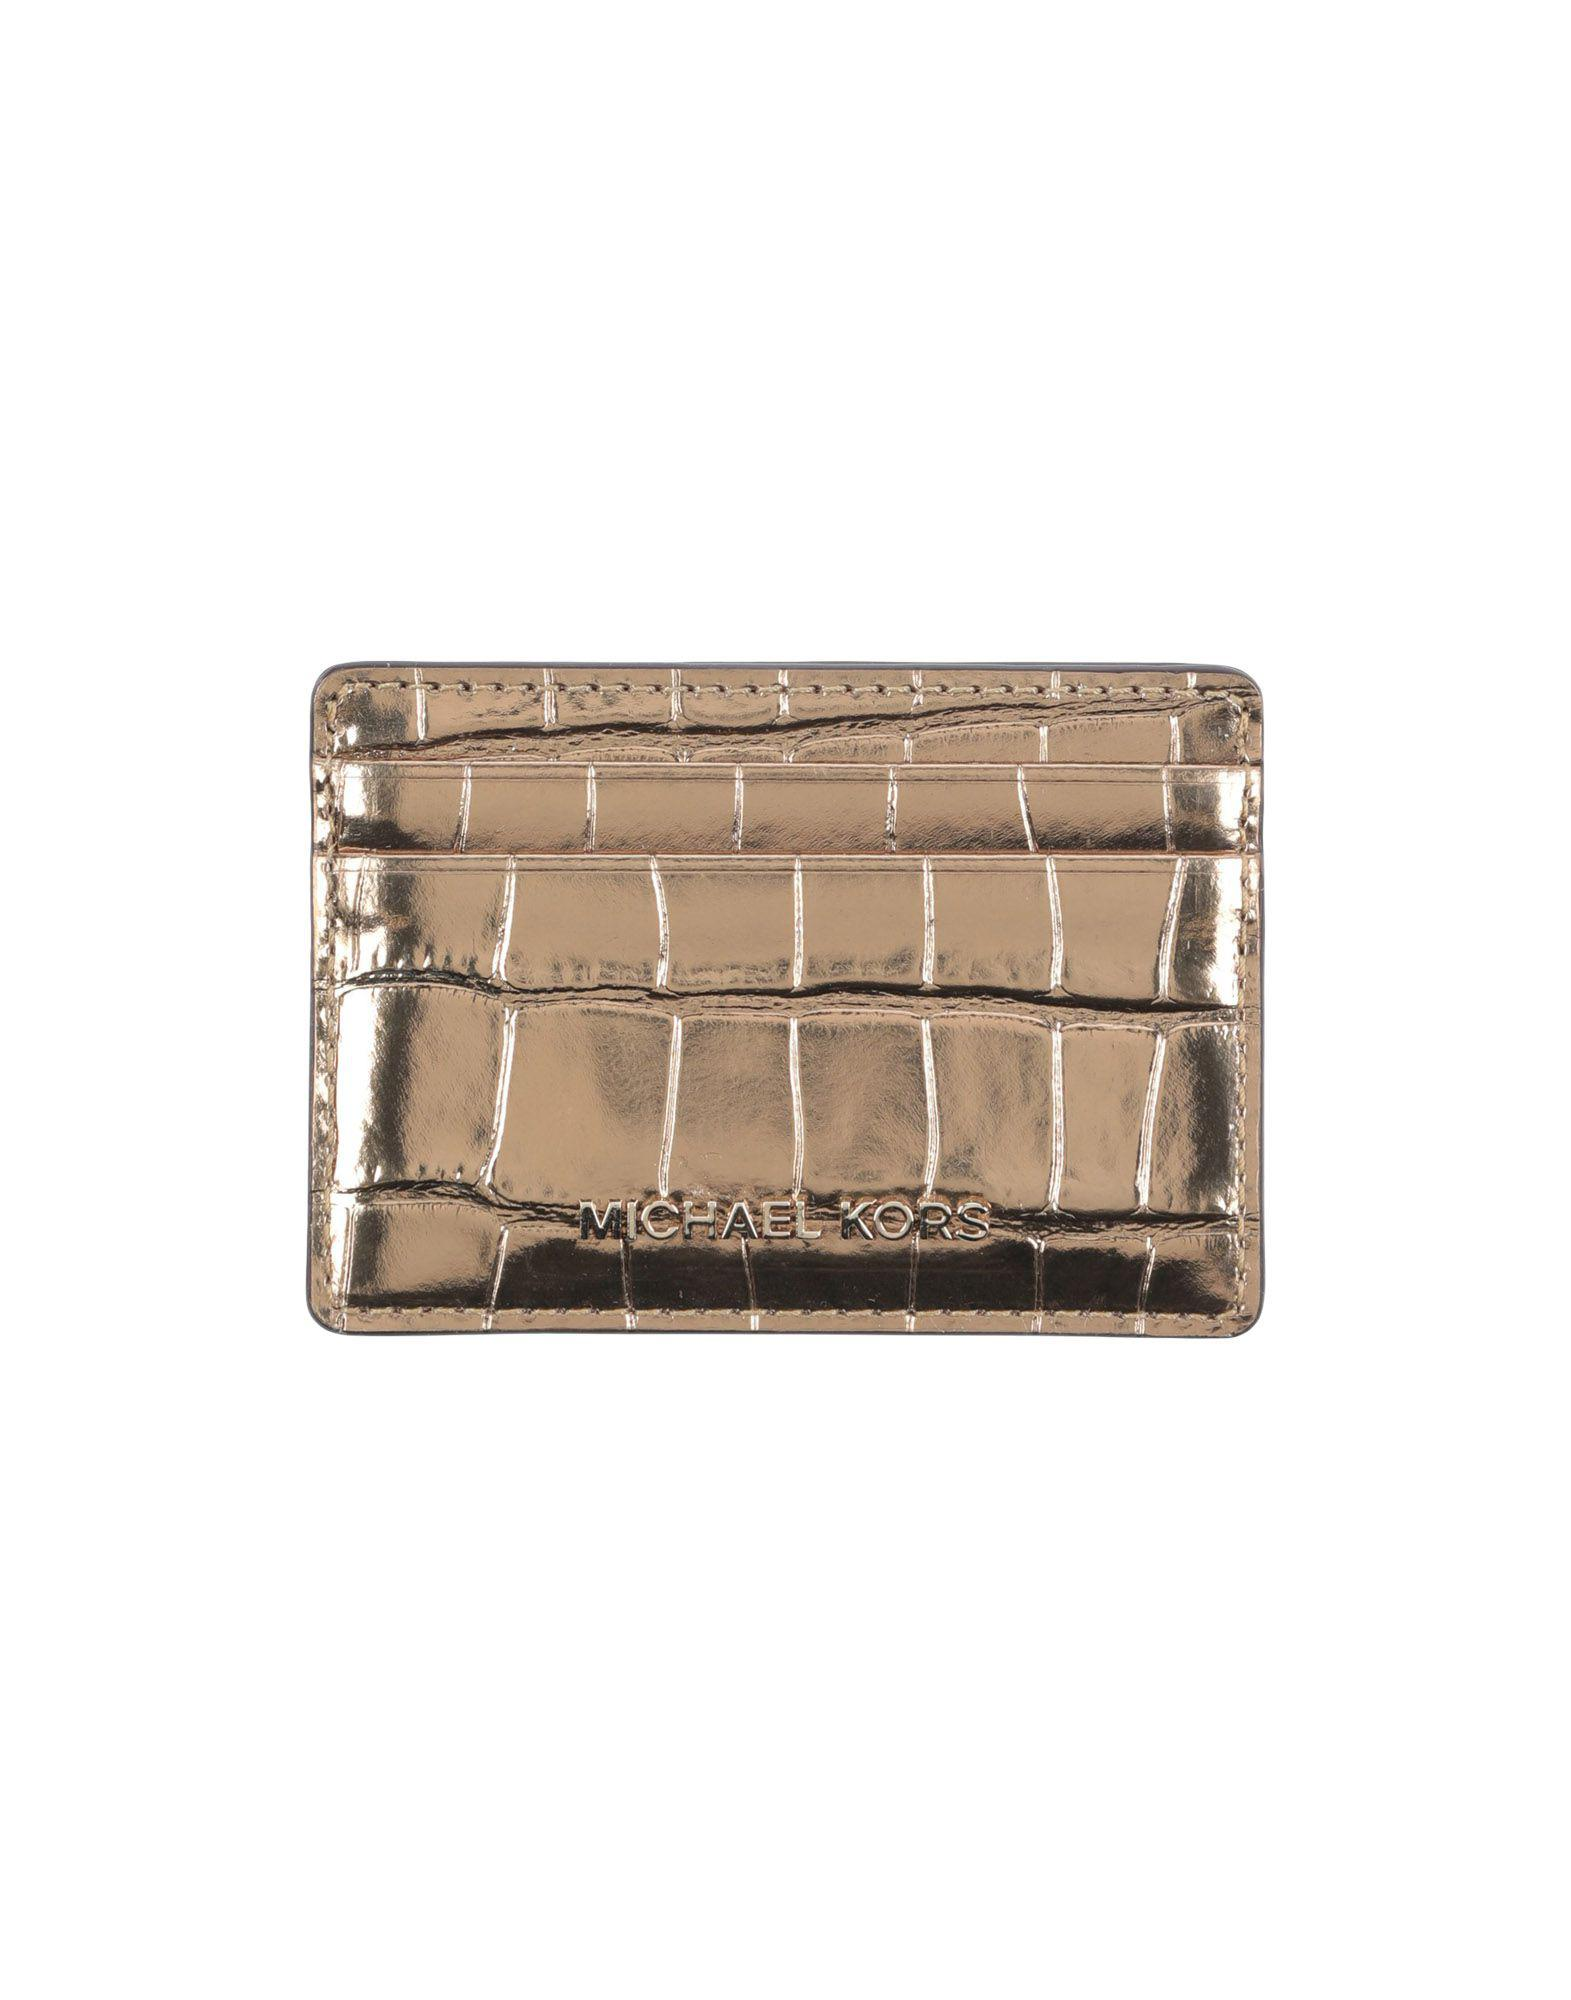 bafddac49c9d Lyst - Michael Michael Kors Document Holders in Metallic